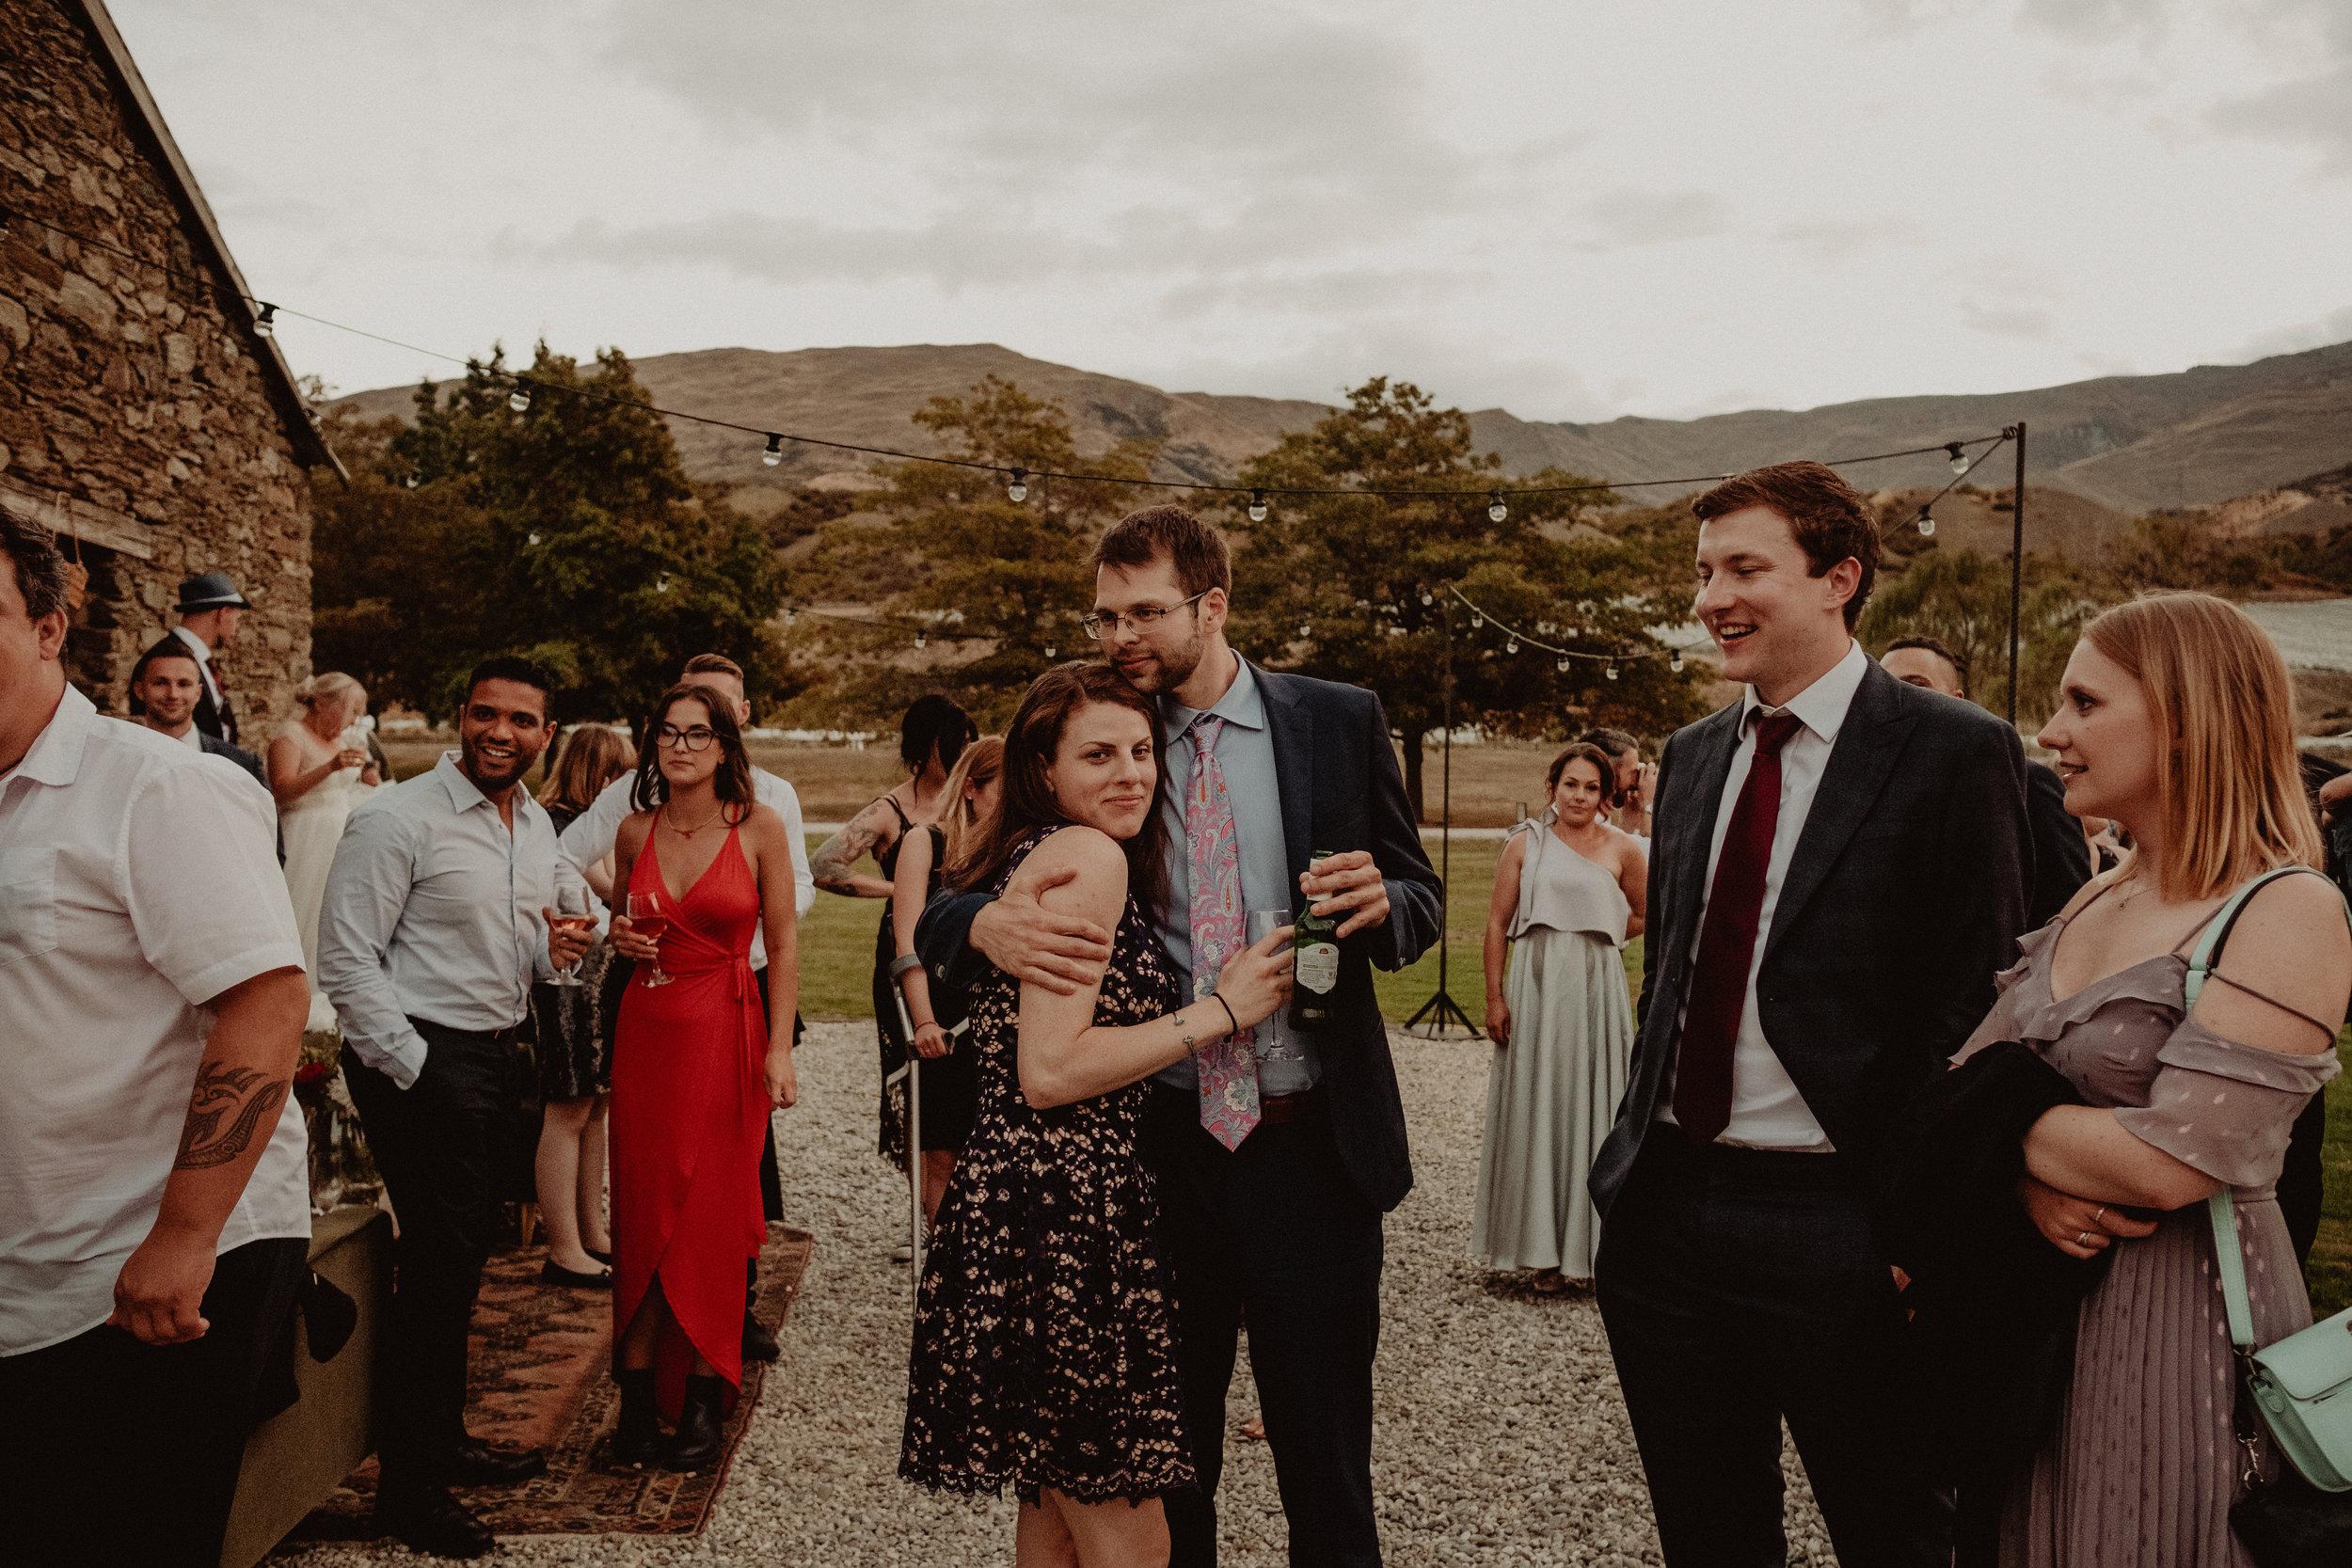 perrigrine wines wedding kseniya and travis chellise michael photography736.JPG